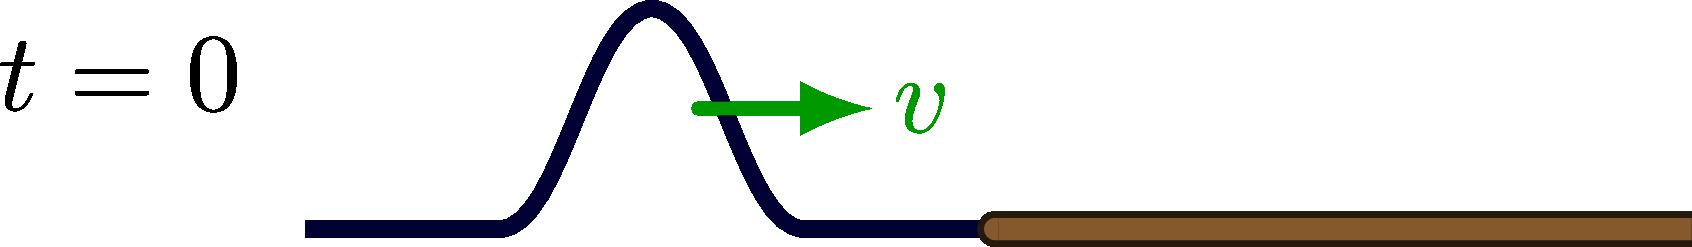 waves_reflection_transmission-005.png